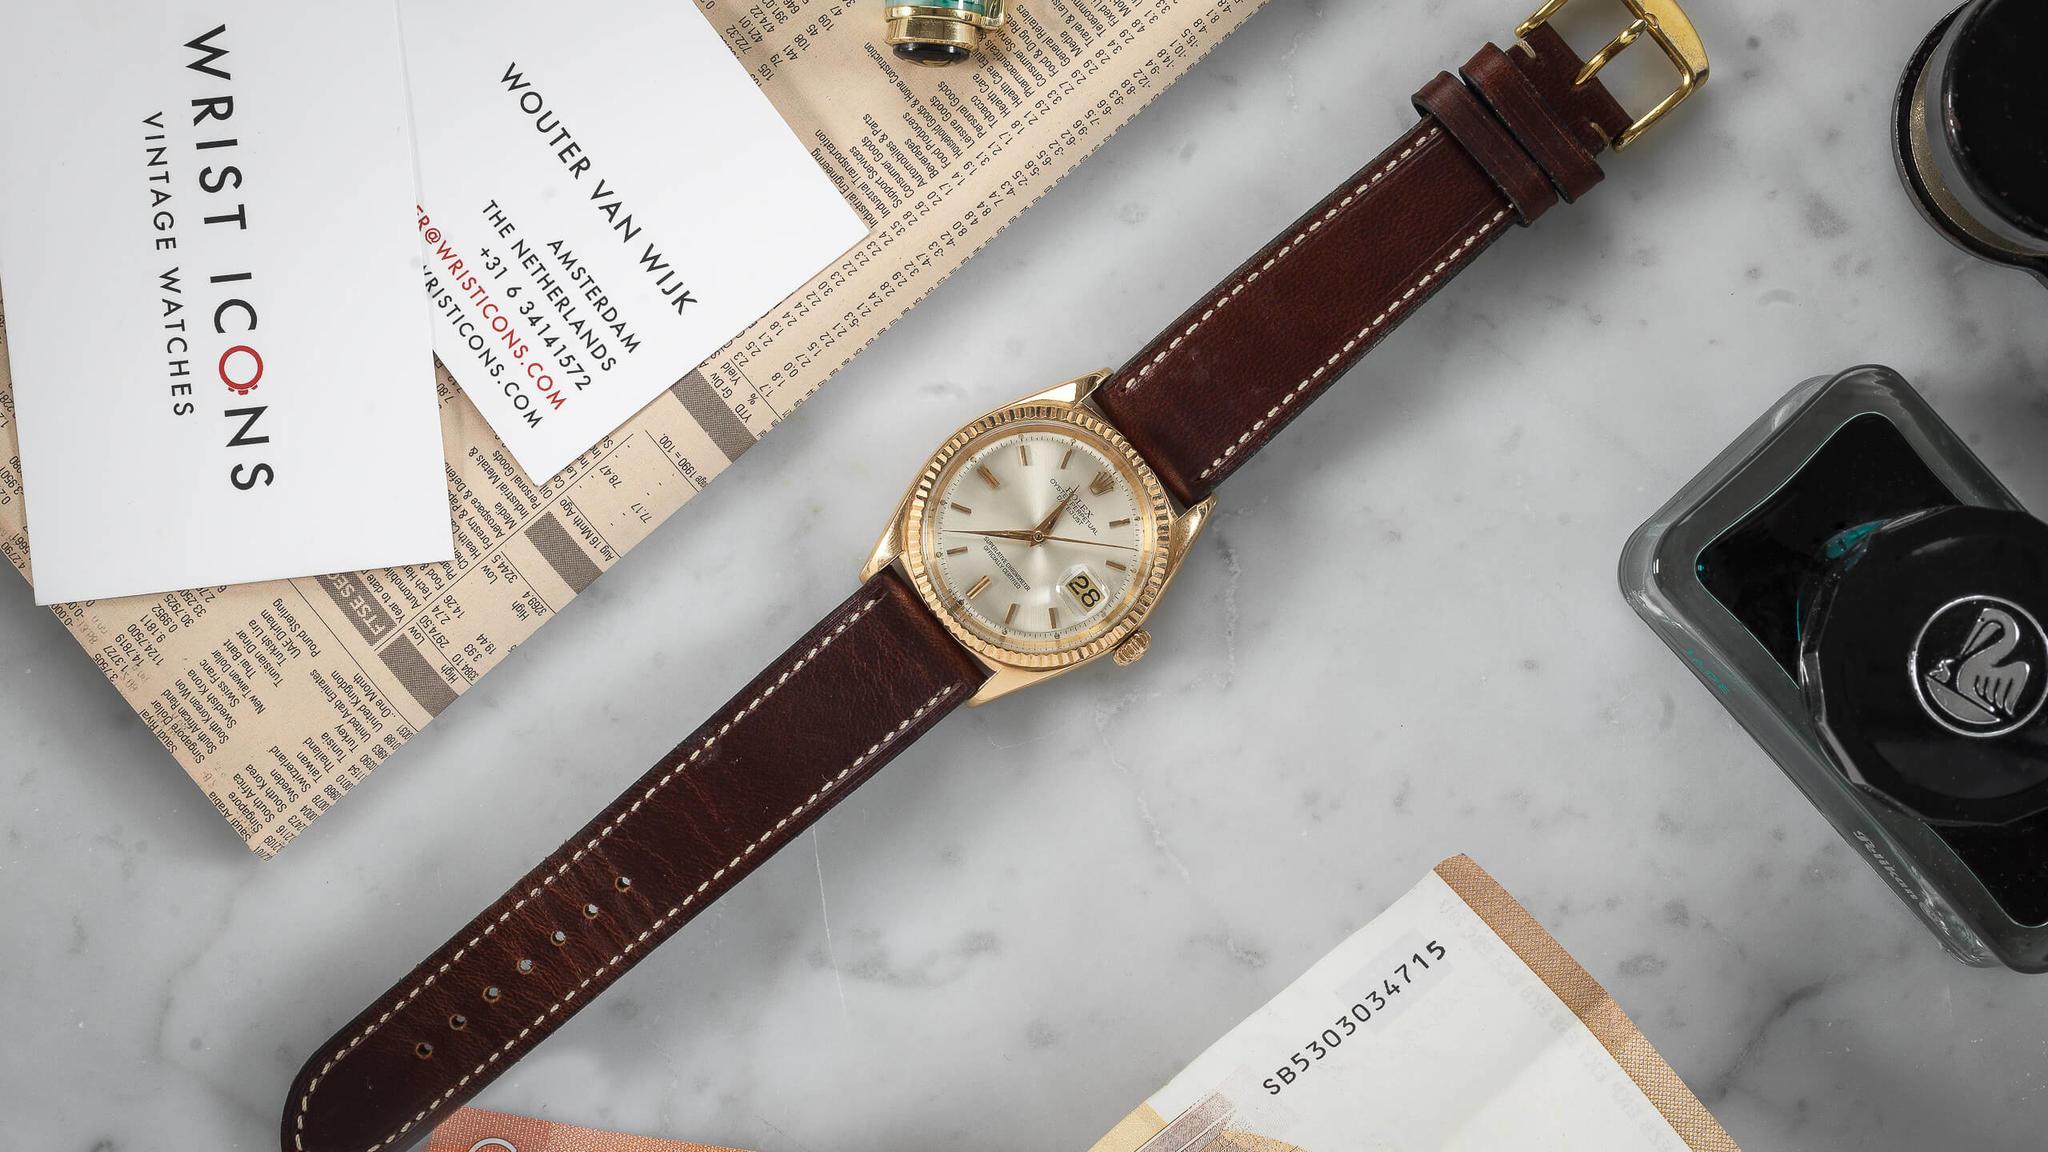 Rolex Datejust 1601 rose gold 1963